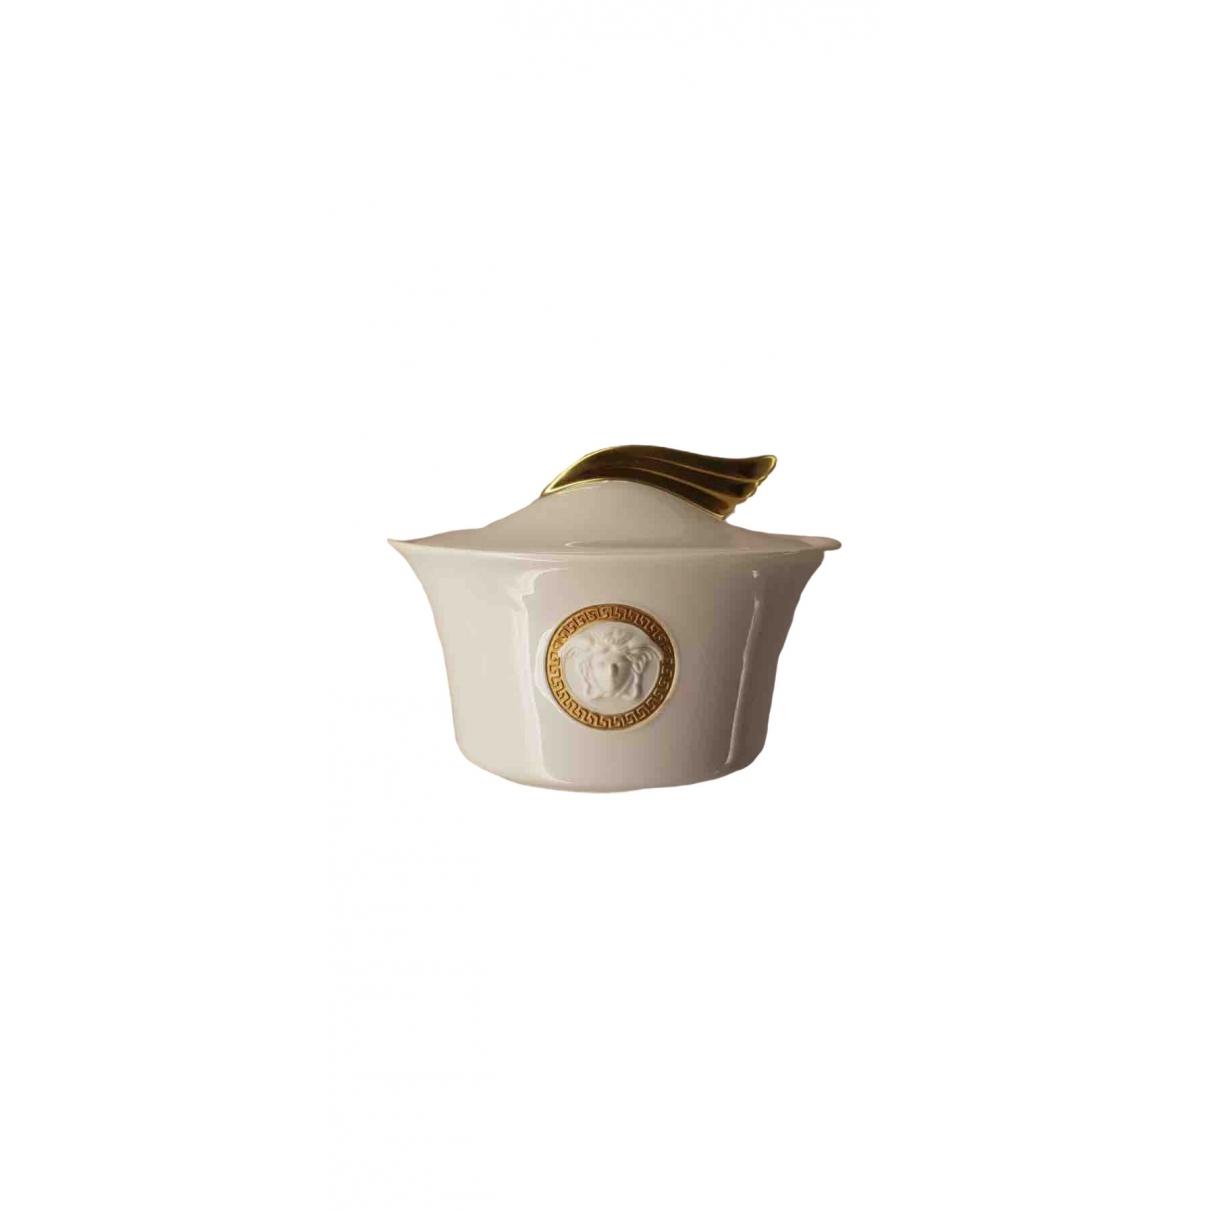 Menaje de mesa de Porcelana Versace